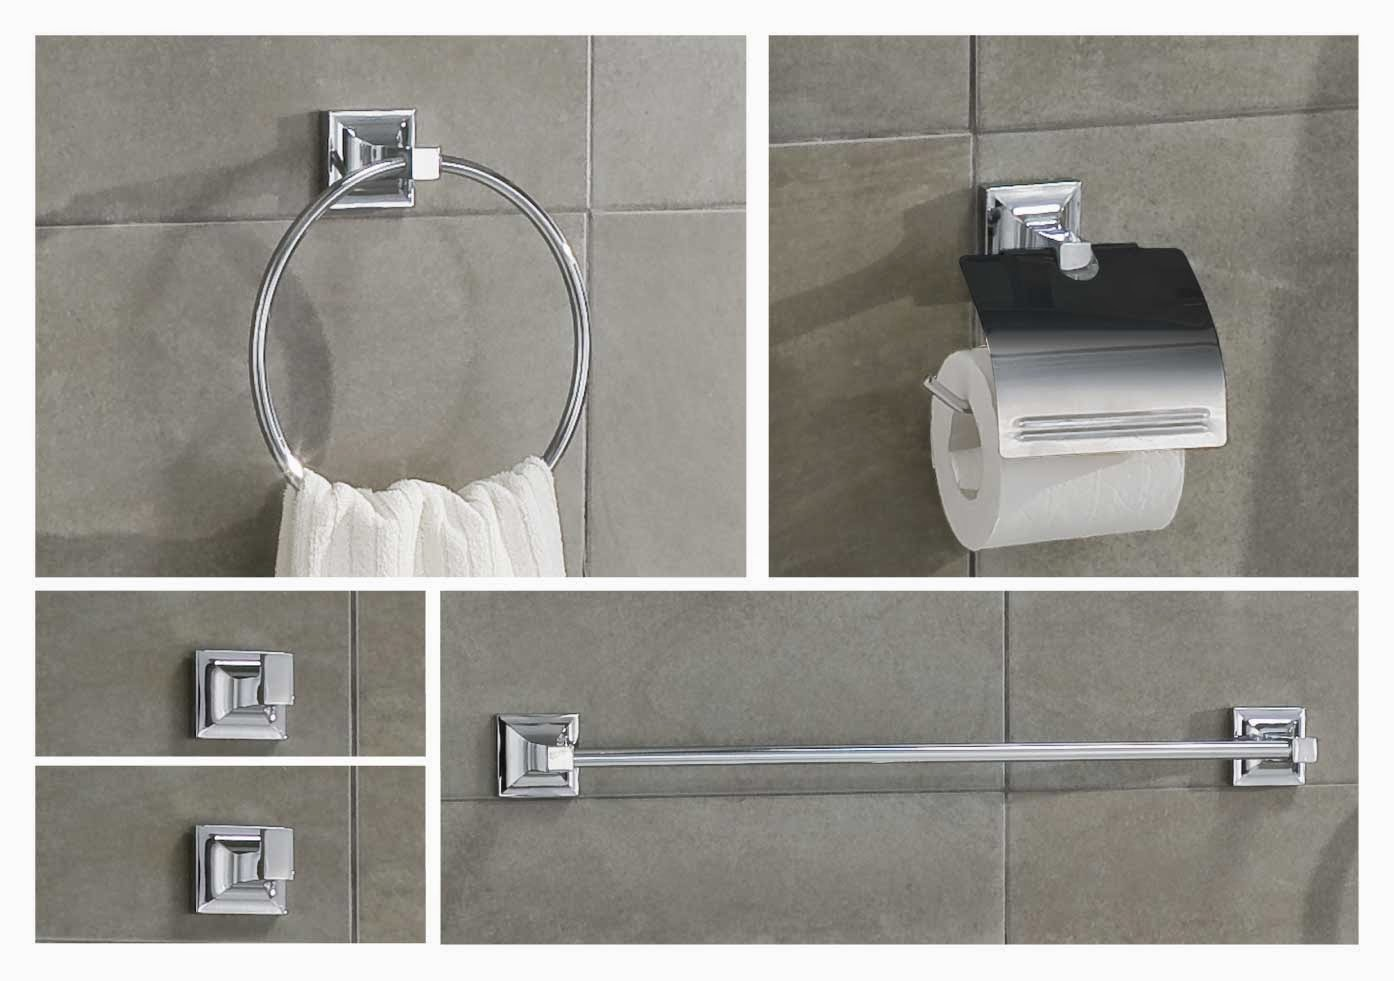 C mo instalar accesorios del ba o ferrelec for Accesorios para regaderas de bano